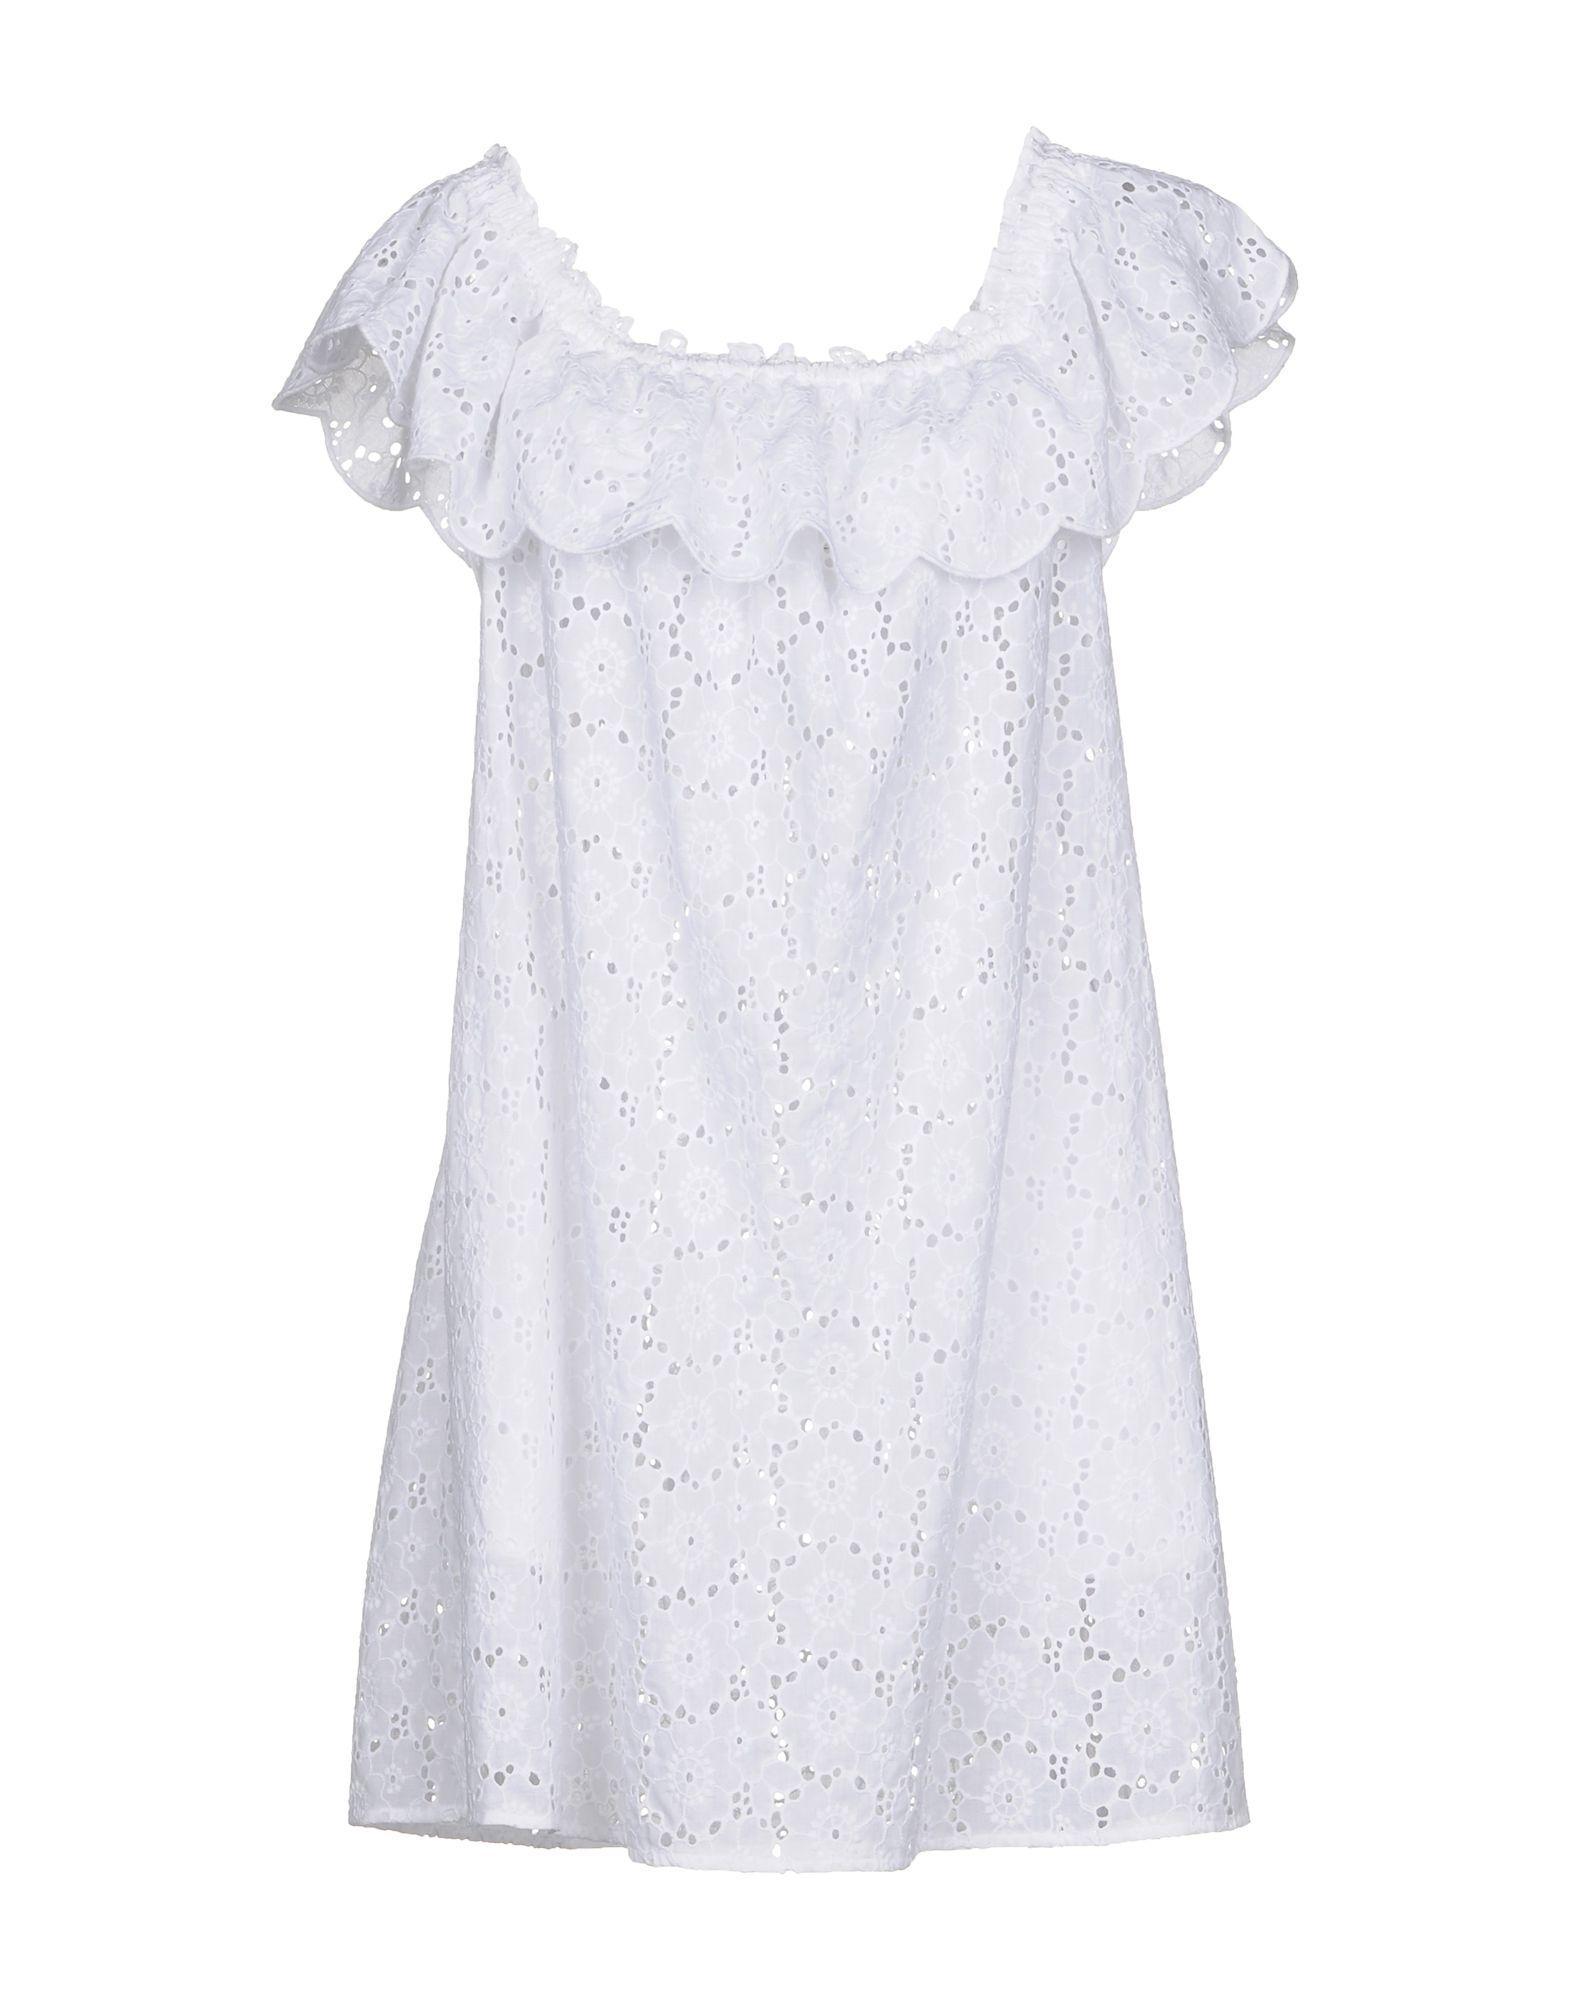 Tory Burch Short Dresses In White